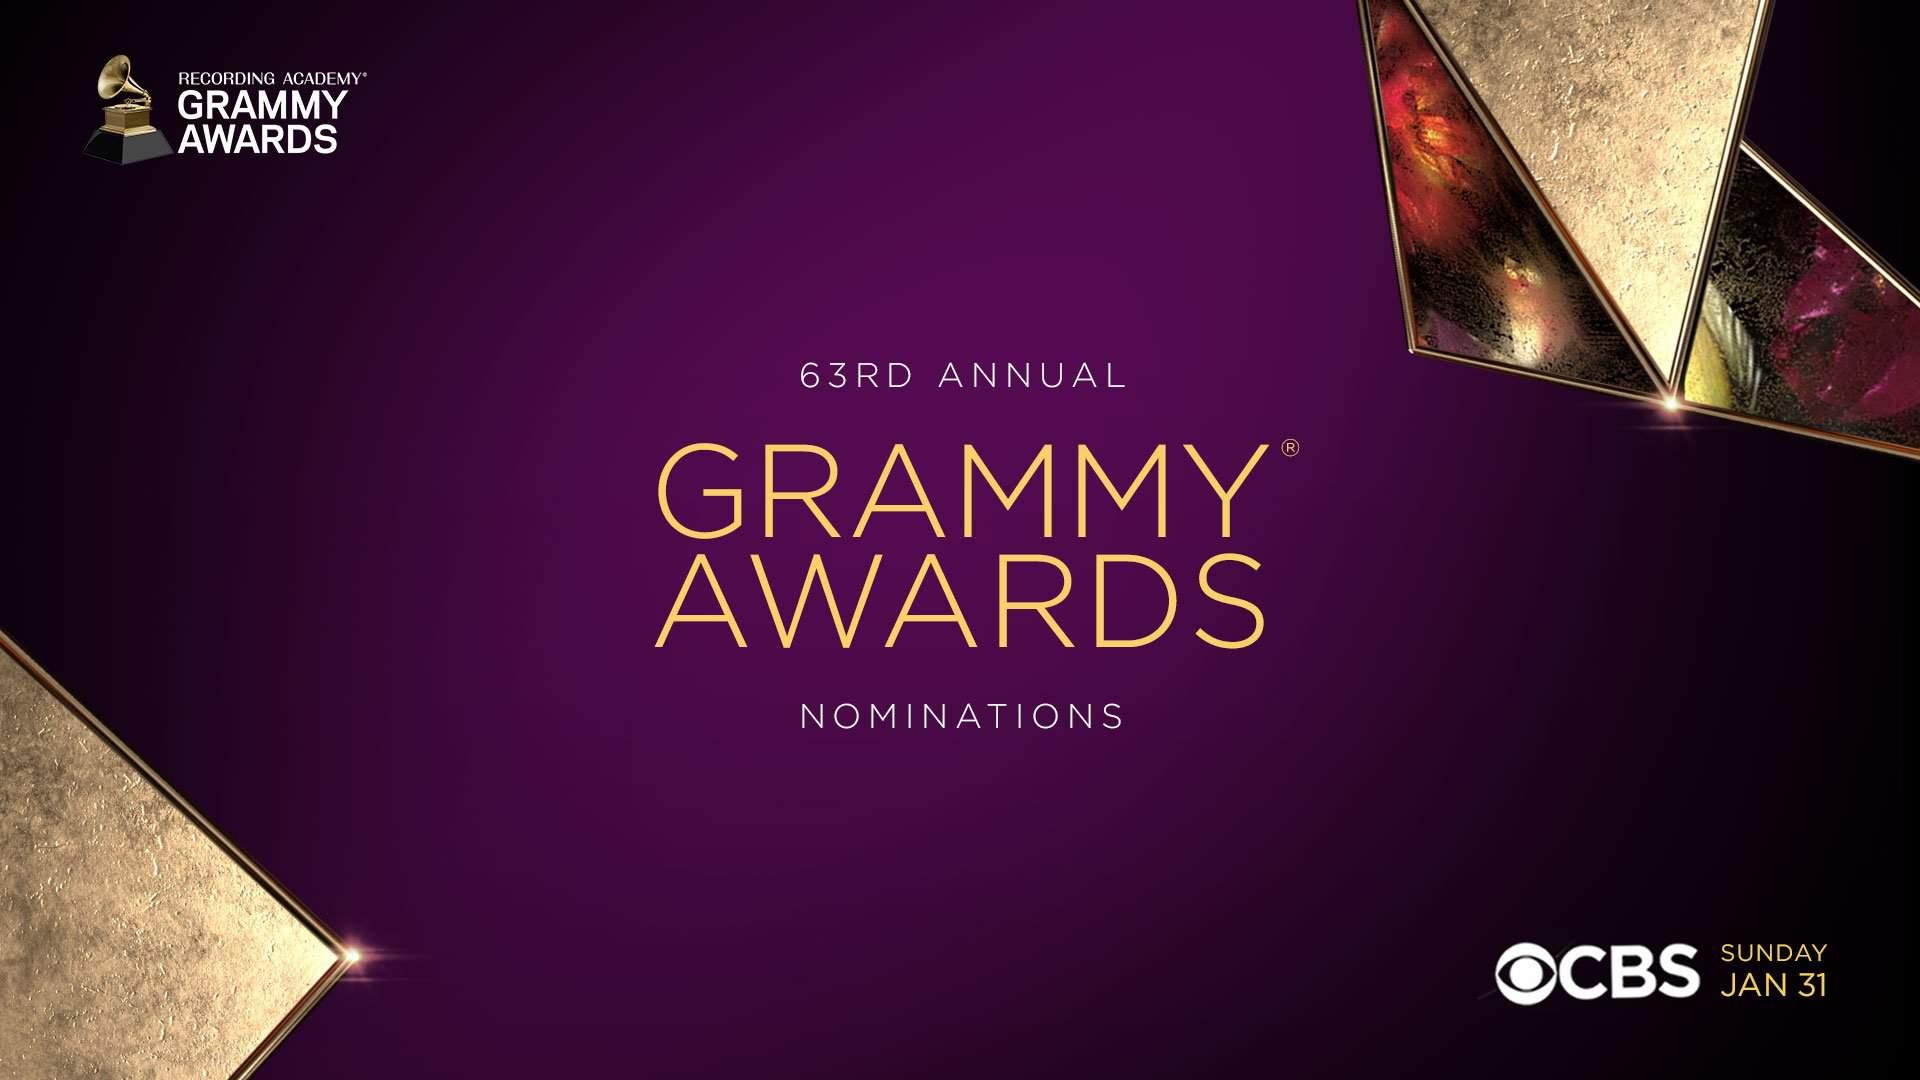 Bts Earns 2021 Grammy Awards Nomination Park Jimin Amino